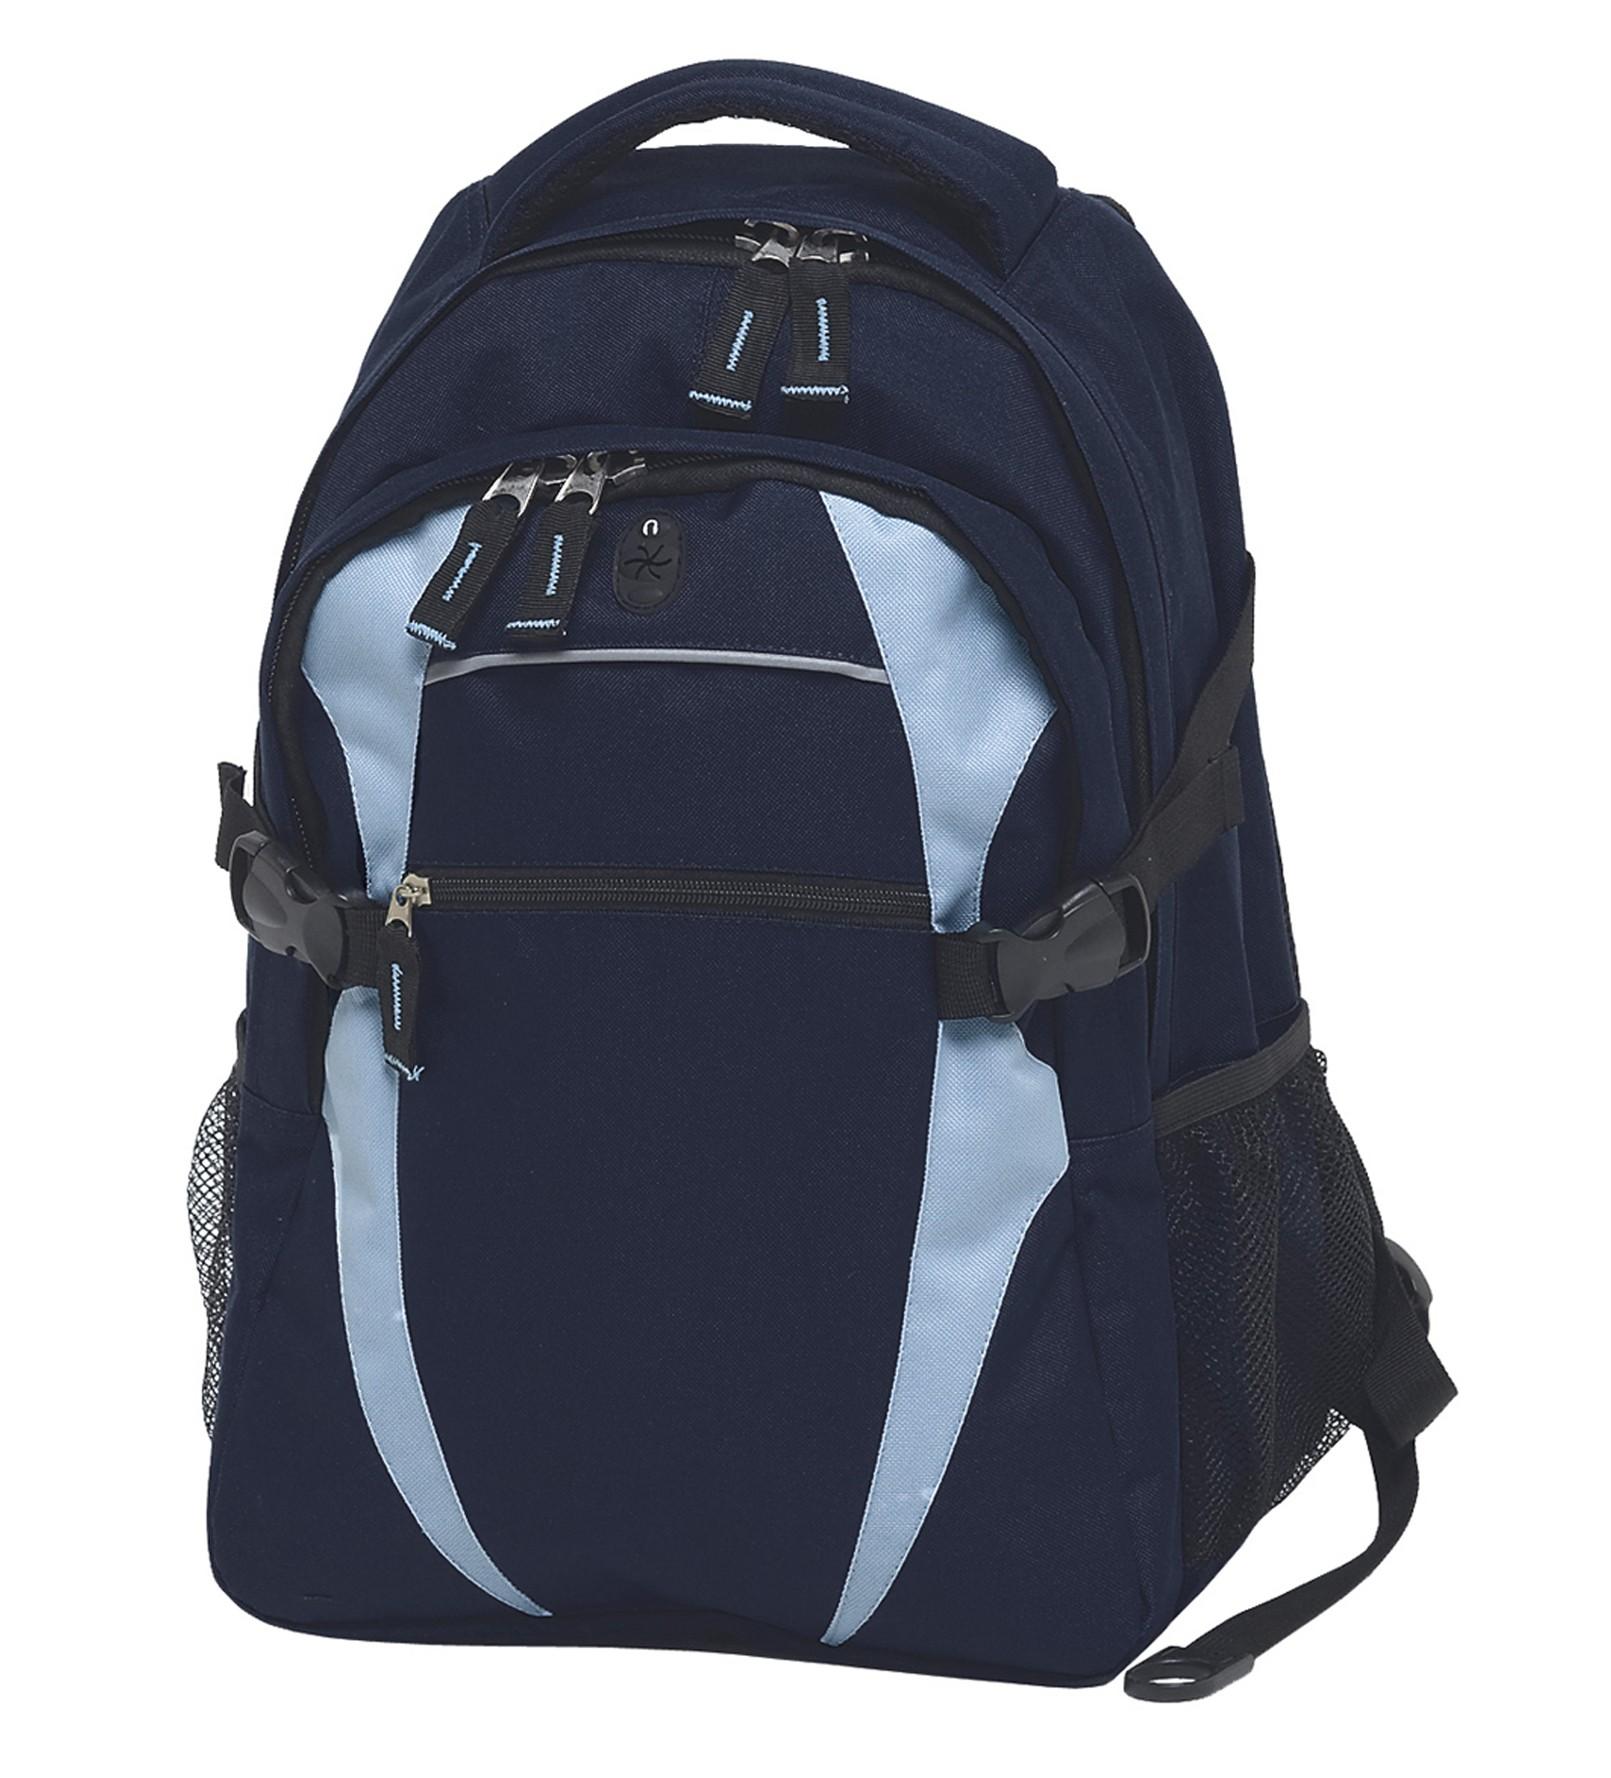 Spliced Zenith Backpack - Navy & Sky